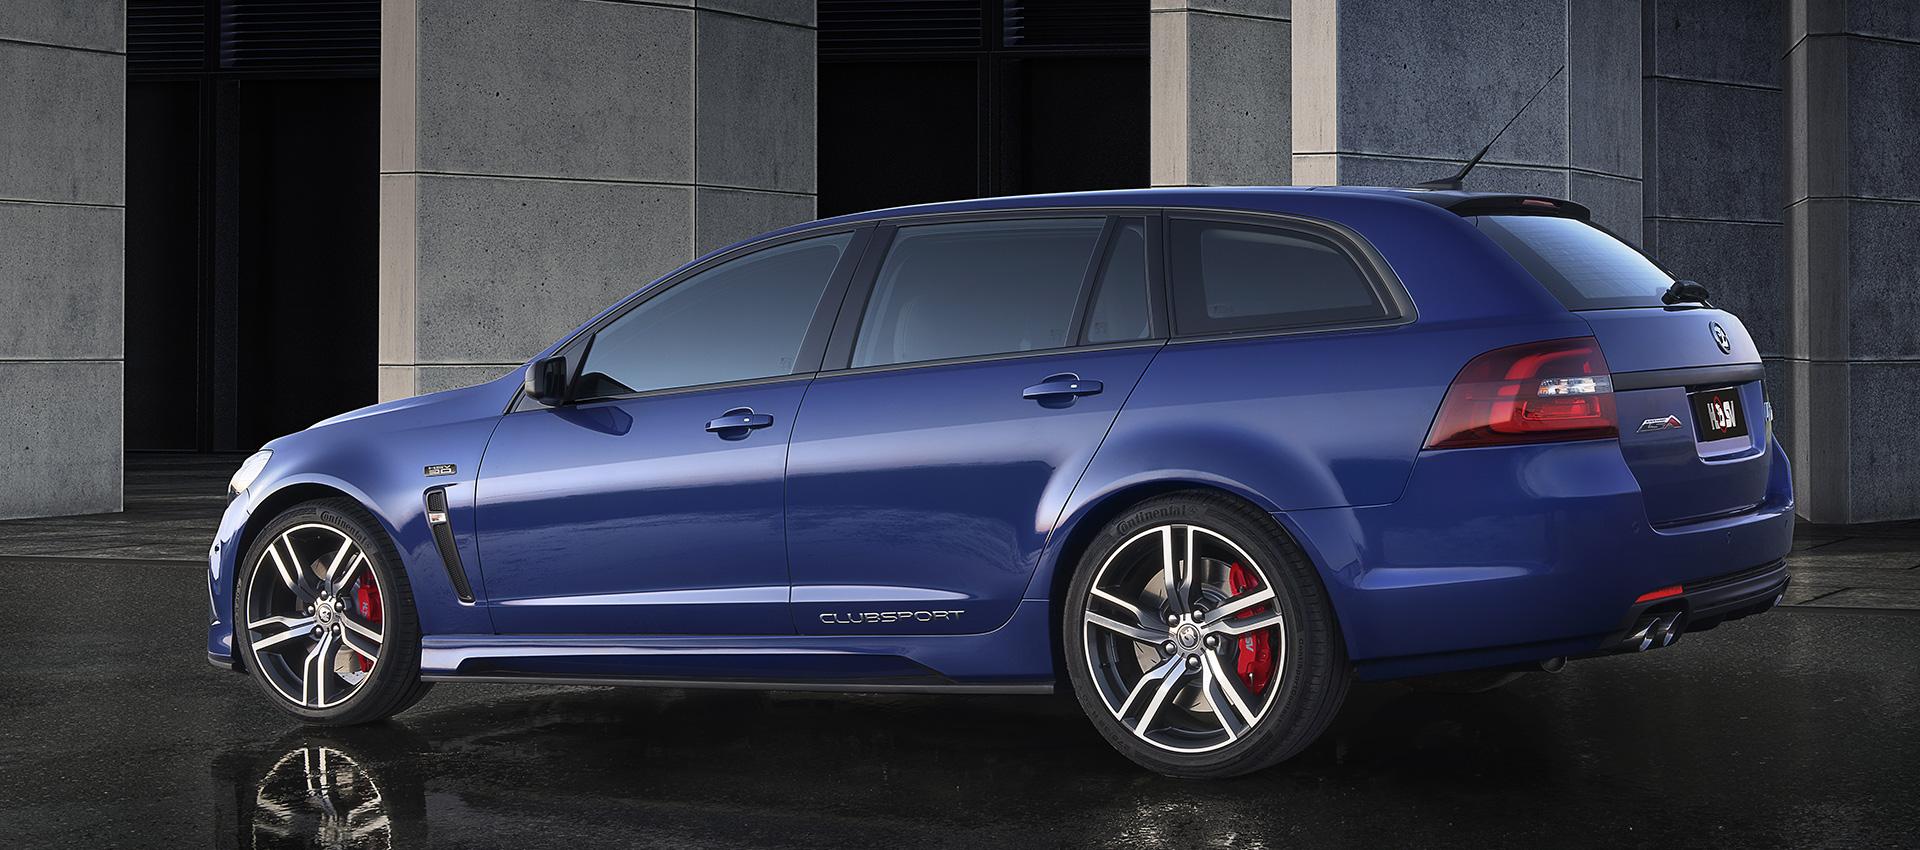 HSV ClubSport R8 Tourer LSA profile Holden wagon